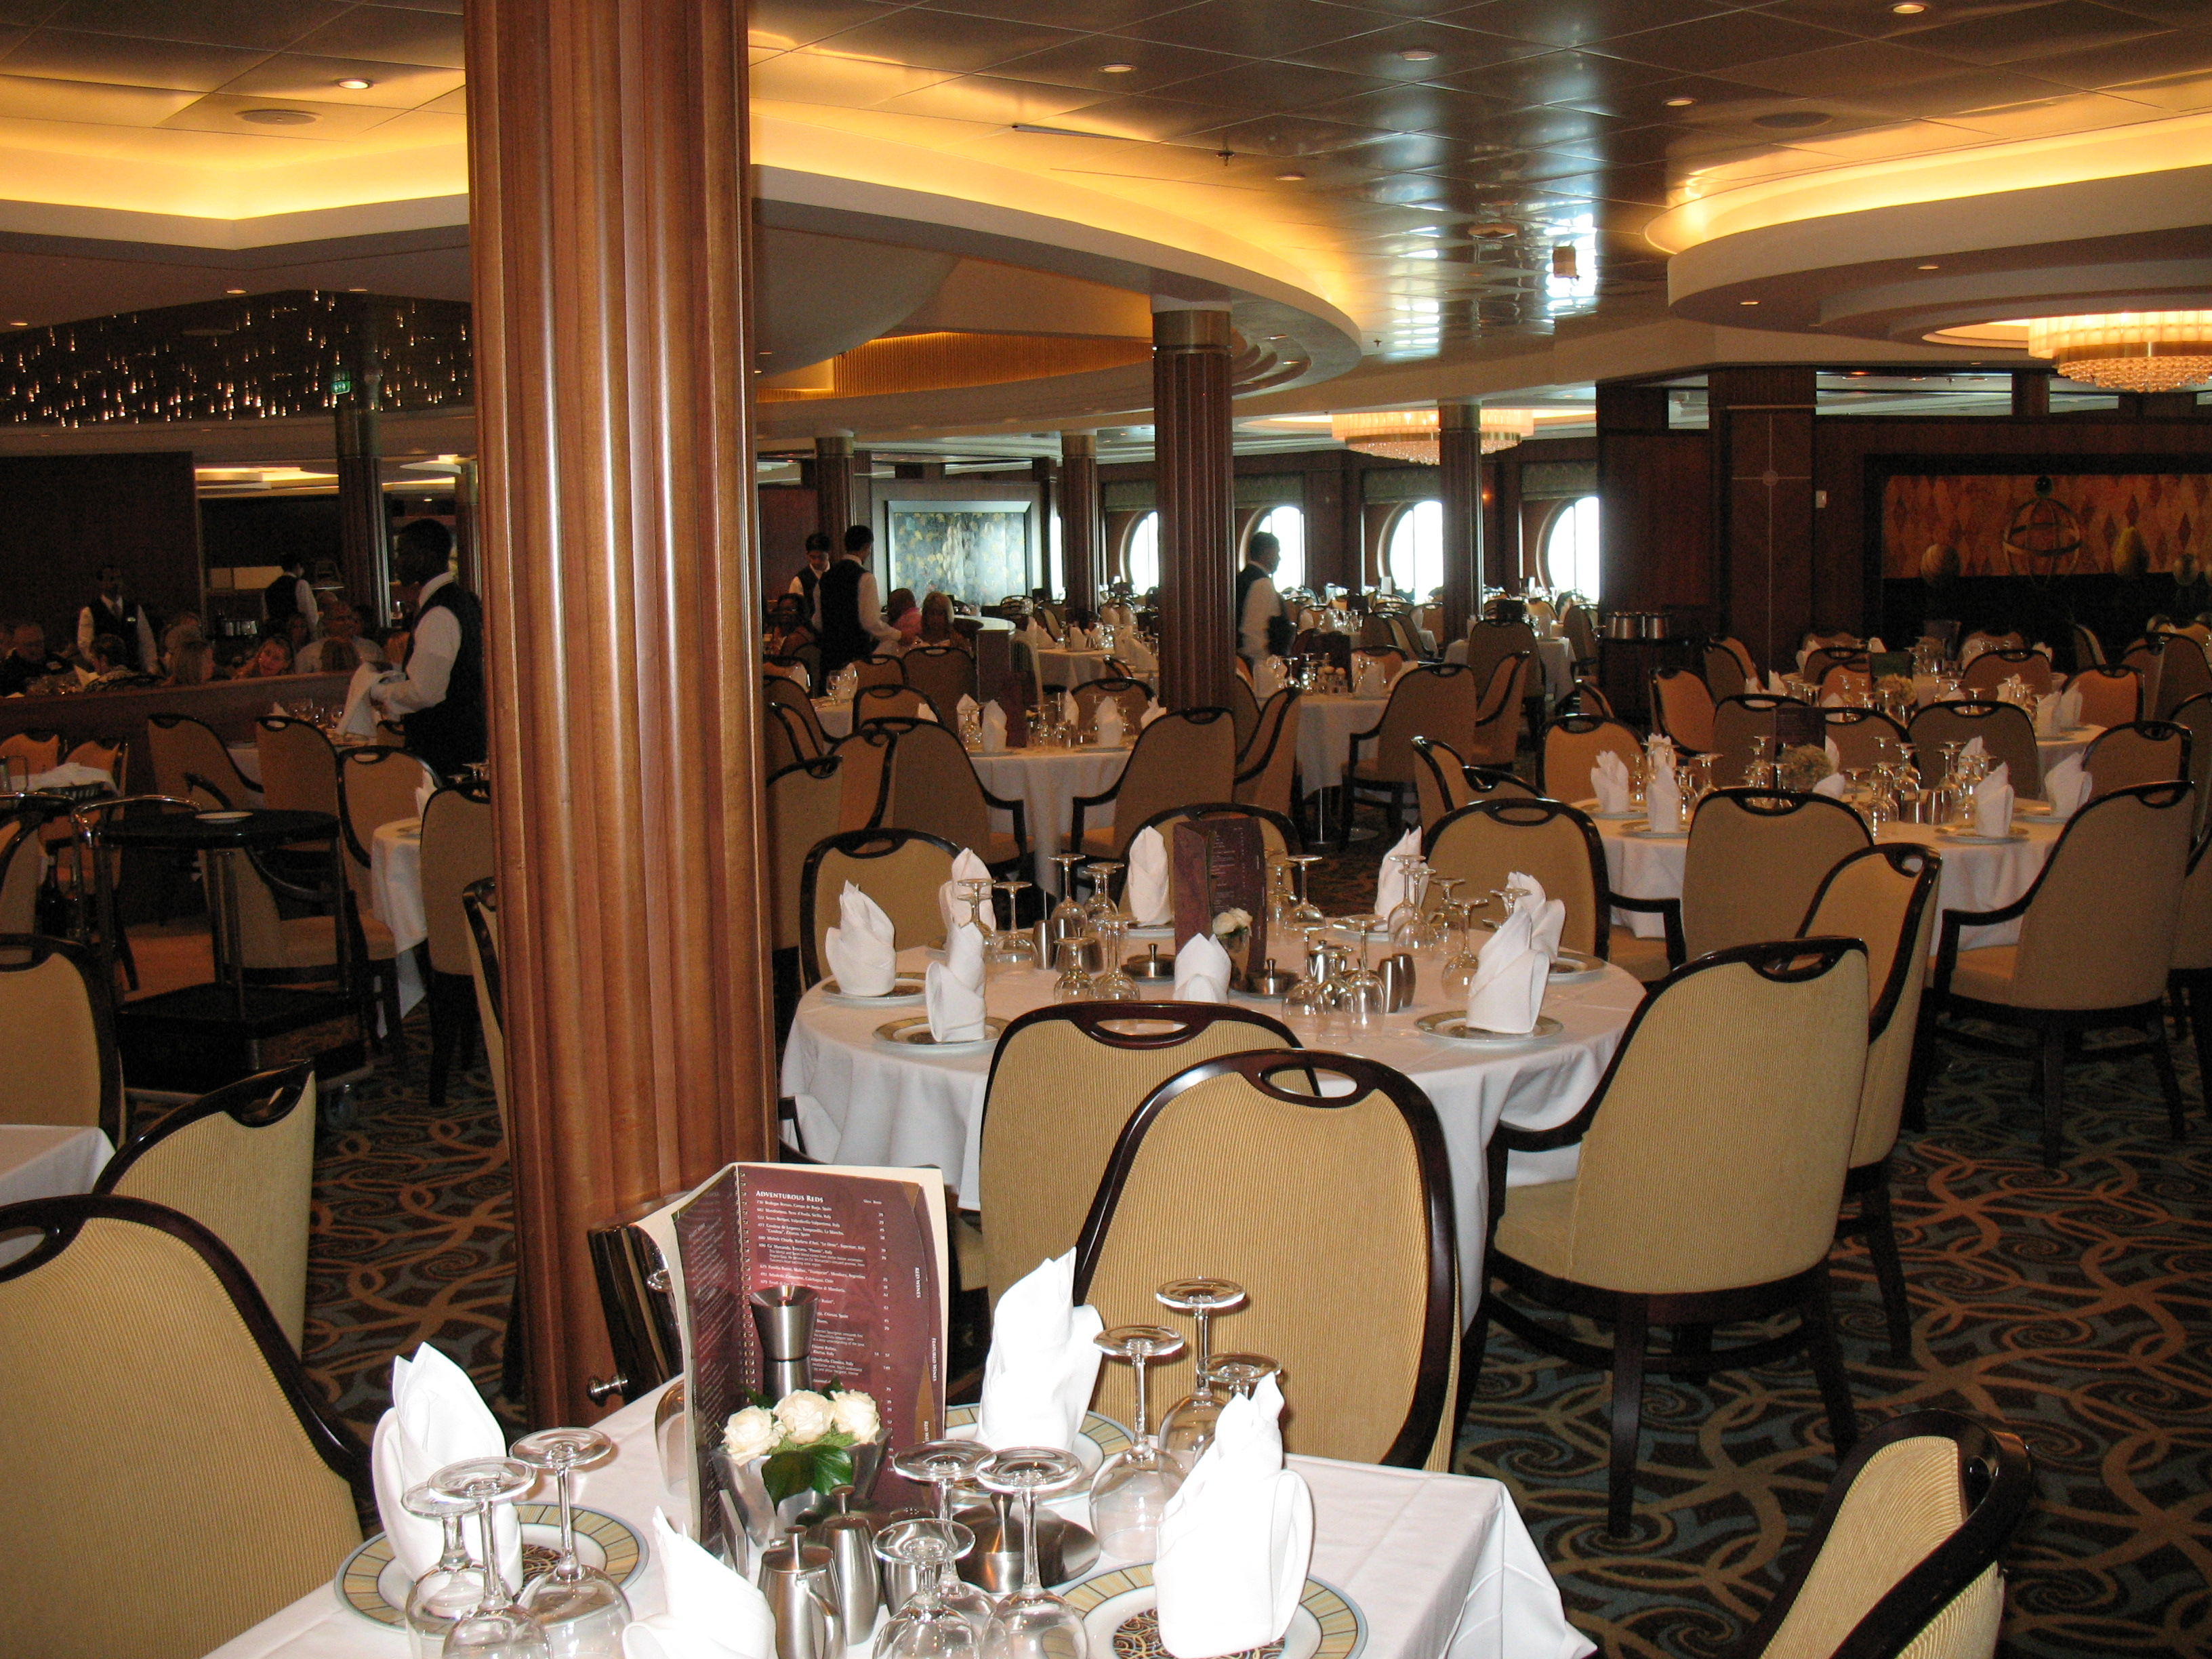 Oasis Of The Seas Dining Room | makitaserviciopanama.com